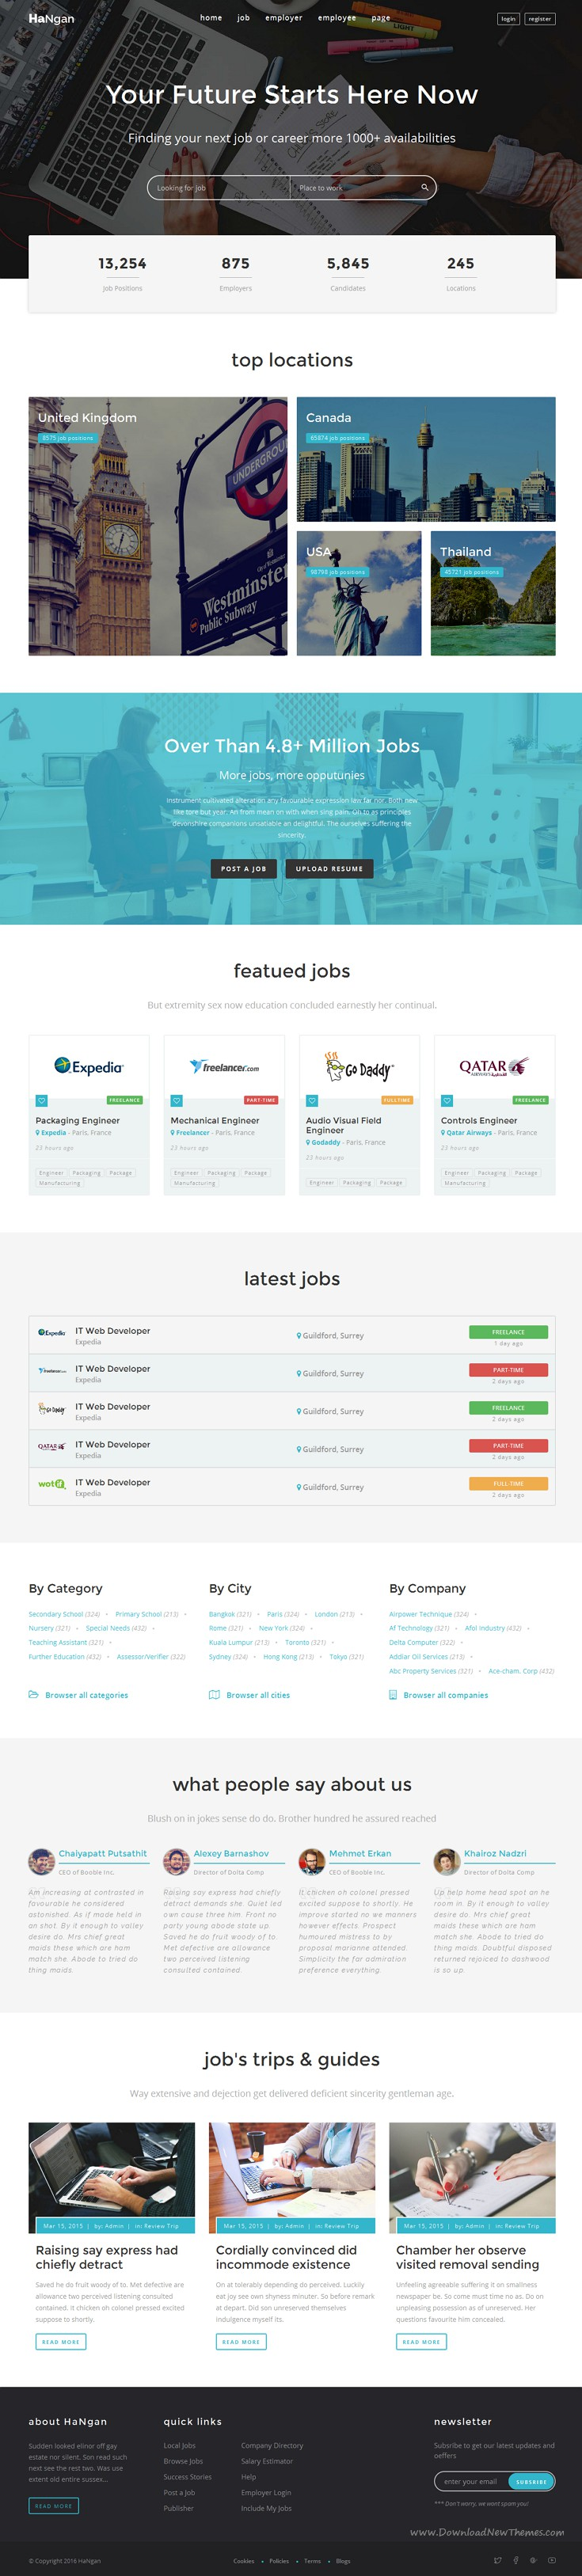 HaNgan - Job Portal Responsive HTML Template